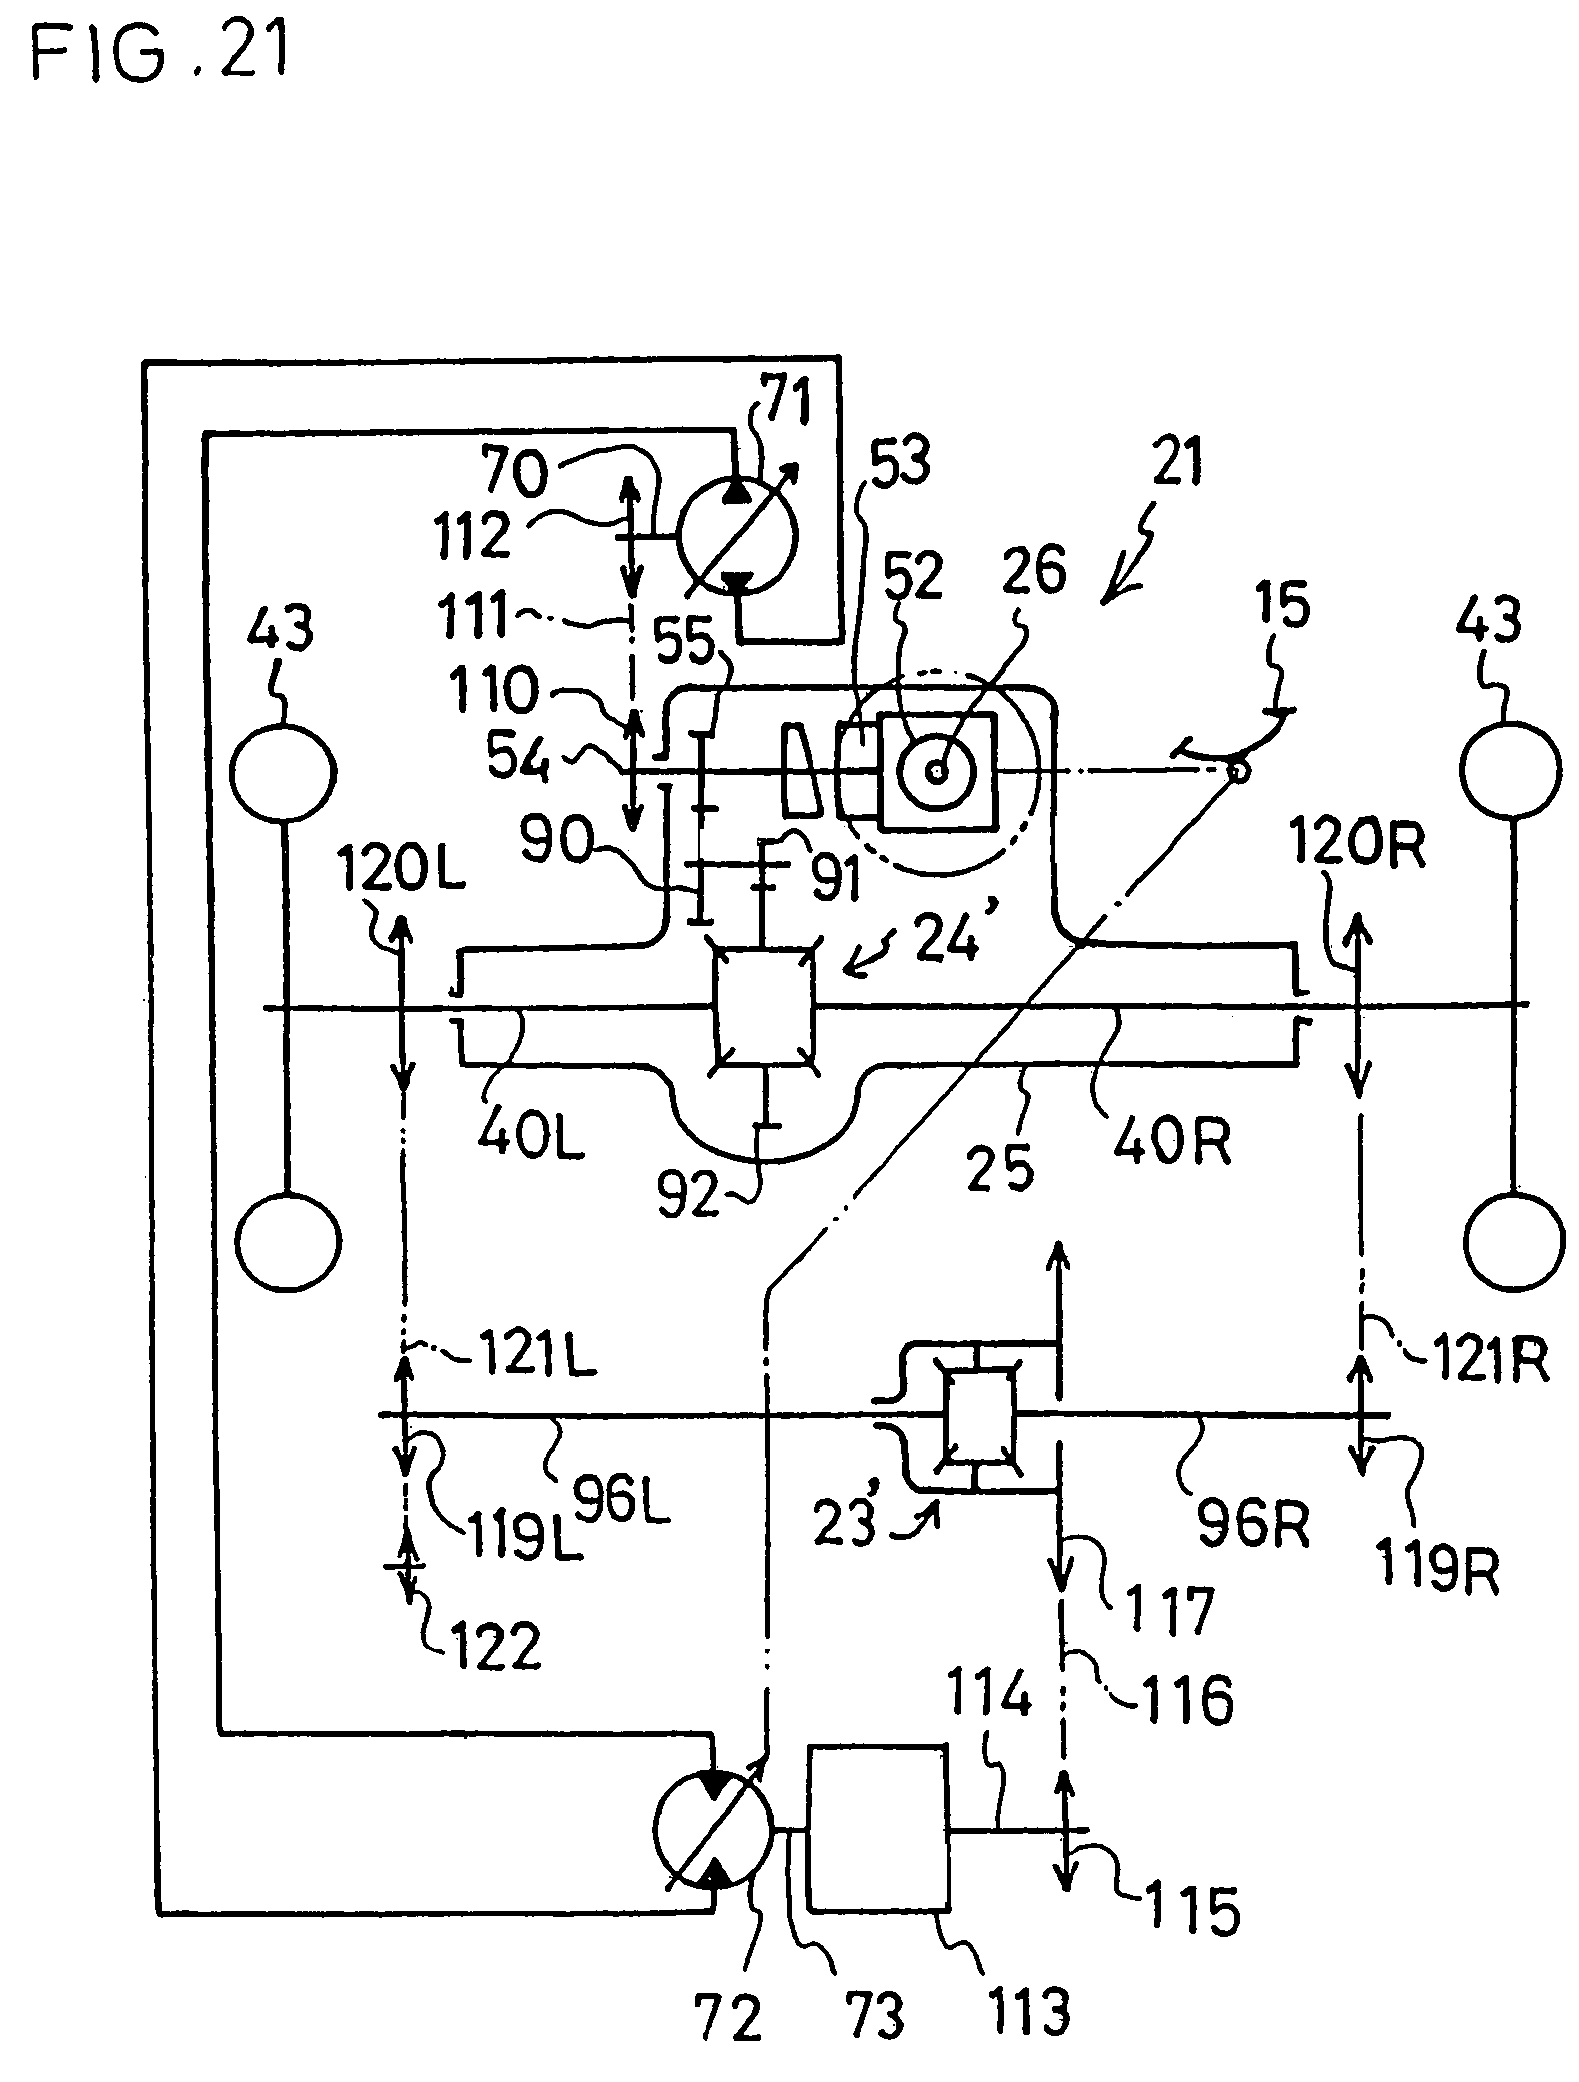 Farmall H Electrical Wiring Diagram